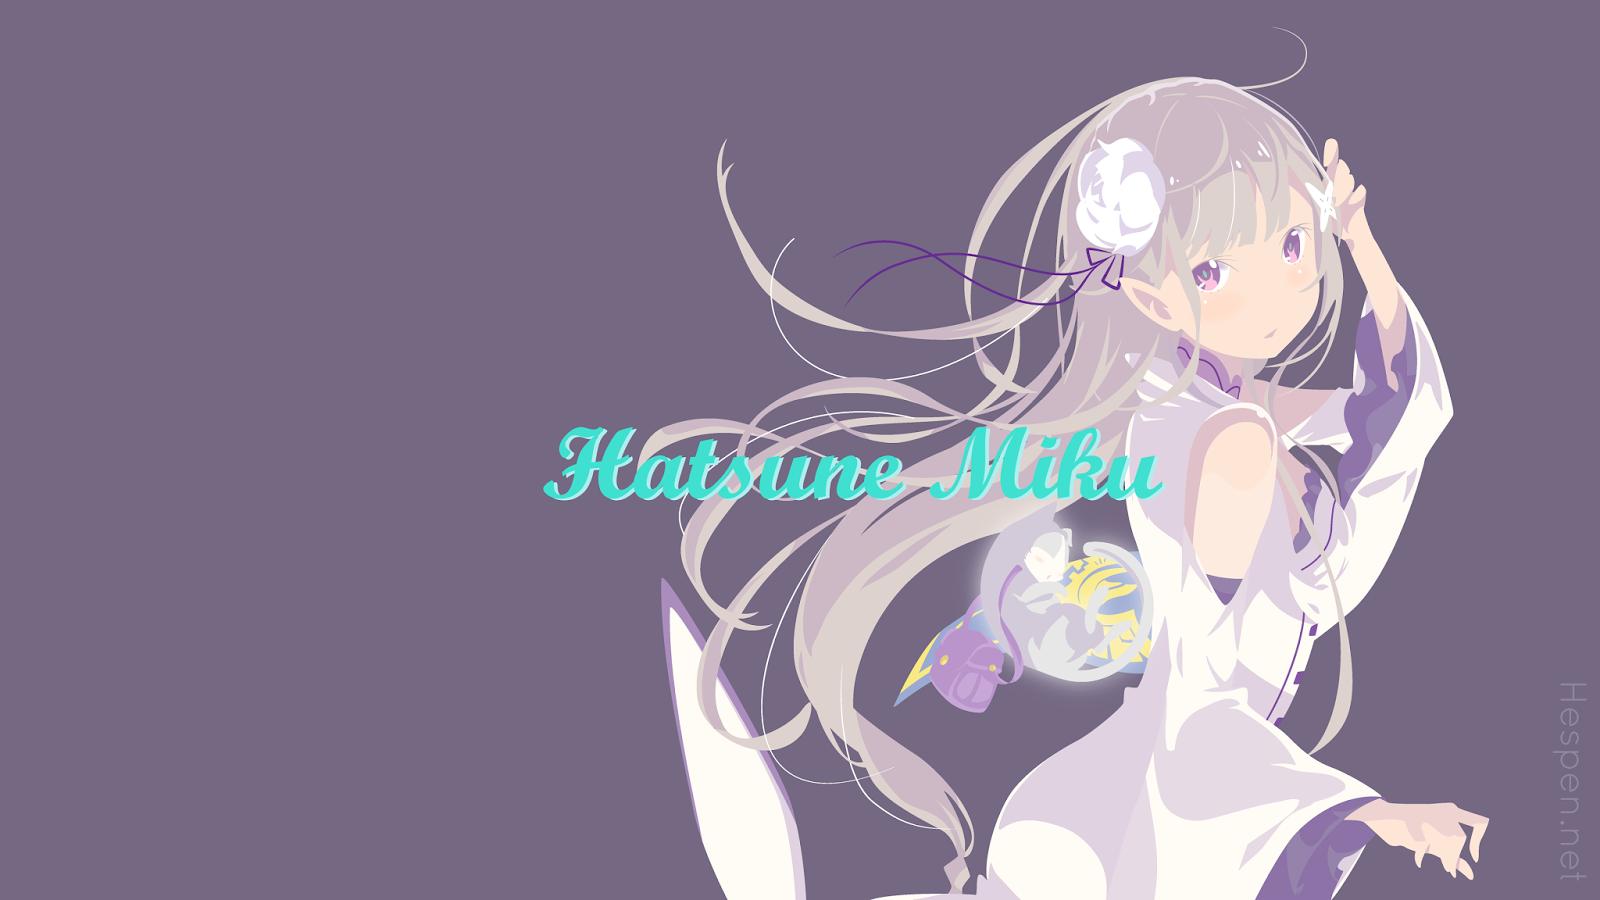 Hatsune Miku Full Album 2